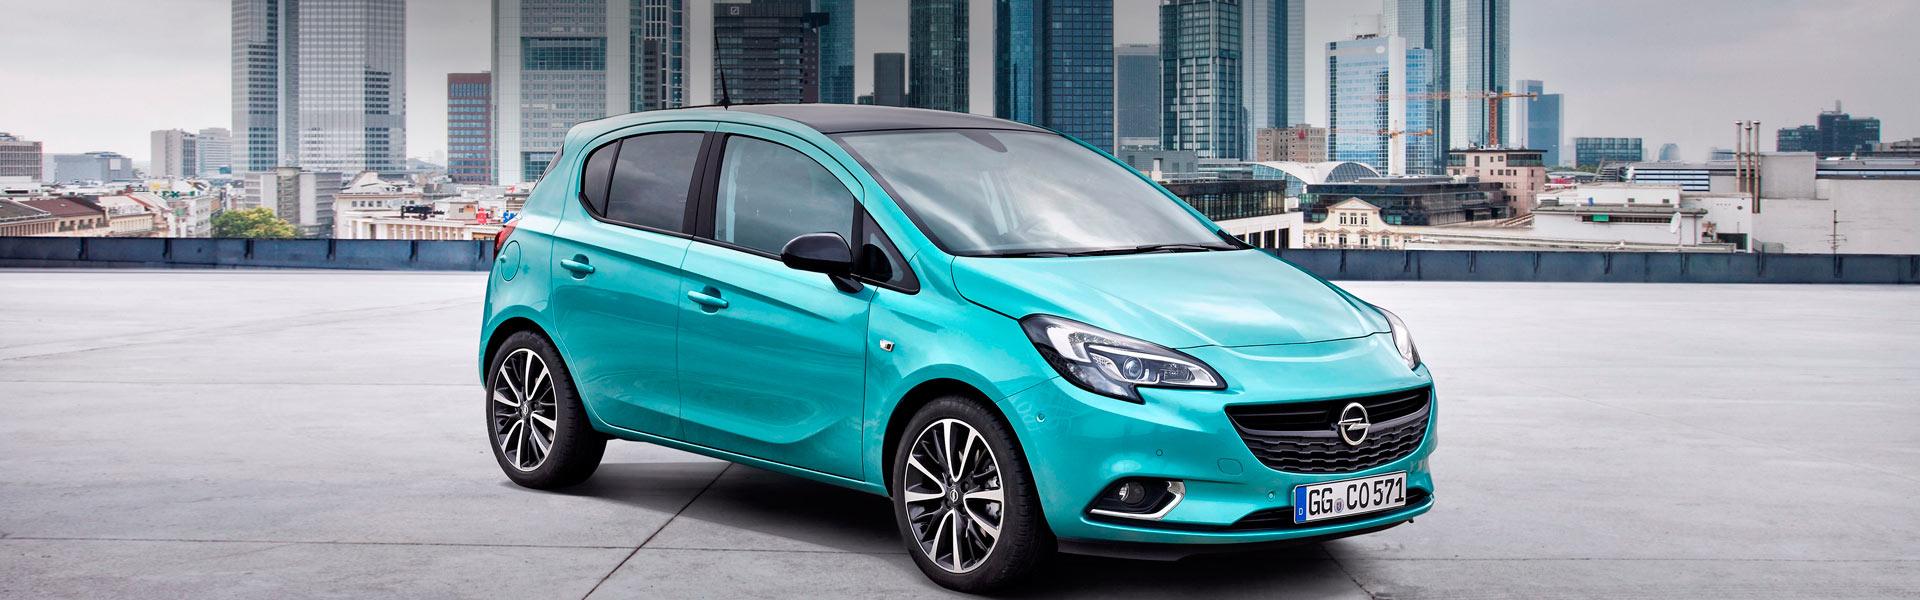 Сайлентблок на Opel Corsa